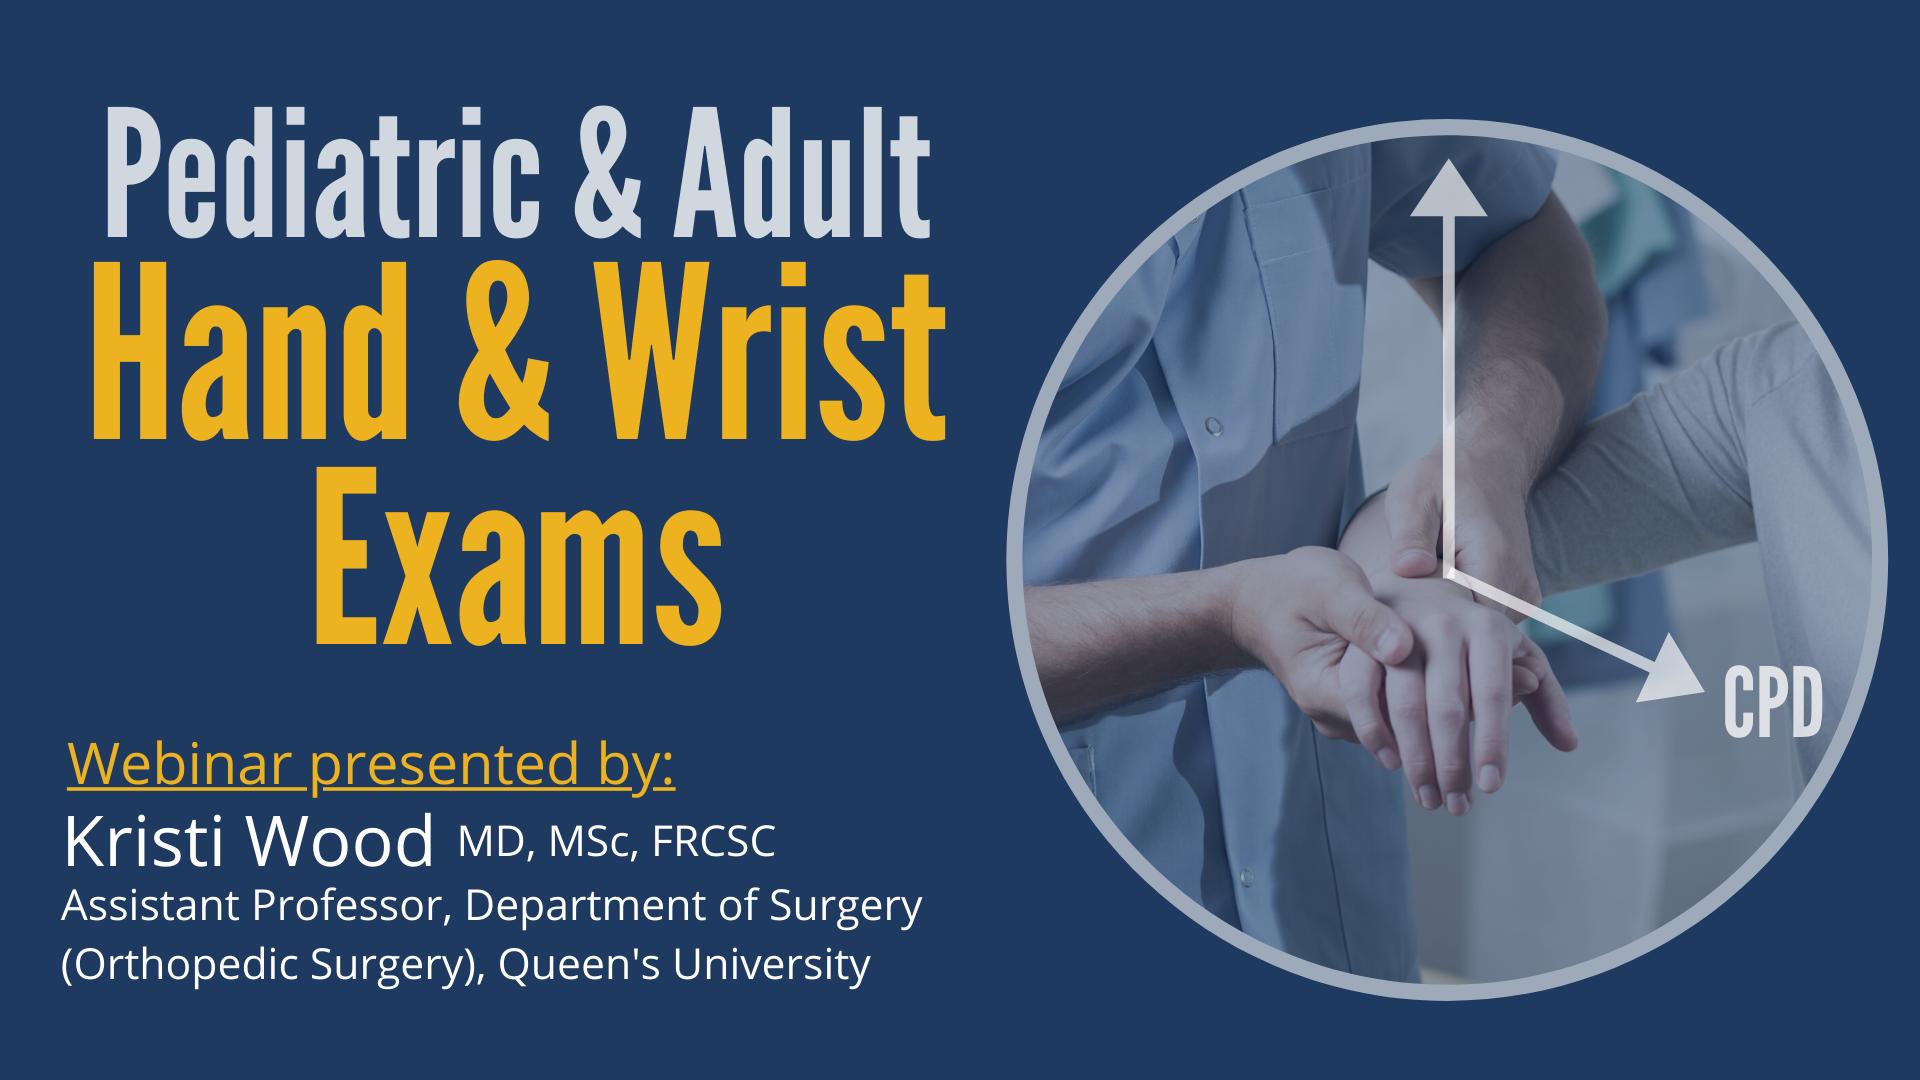 Wednesday, June 3 | 4:00 PM; Pediatric & Adult  Hand & Wrist Exams